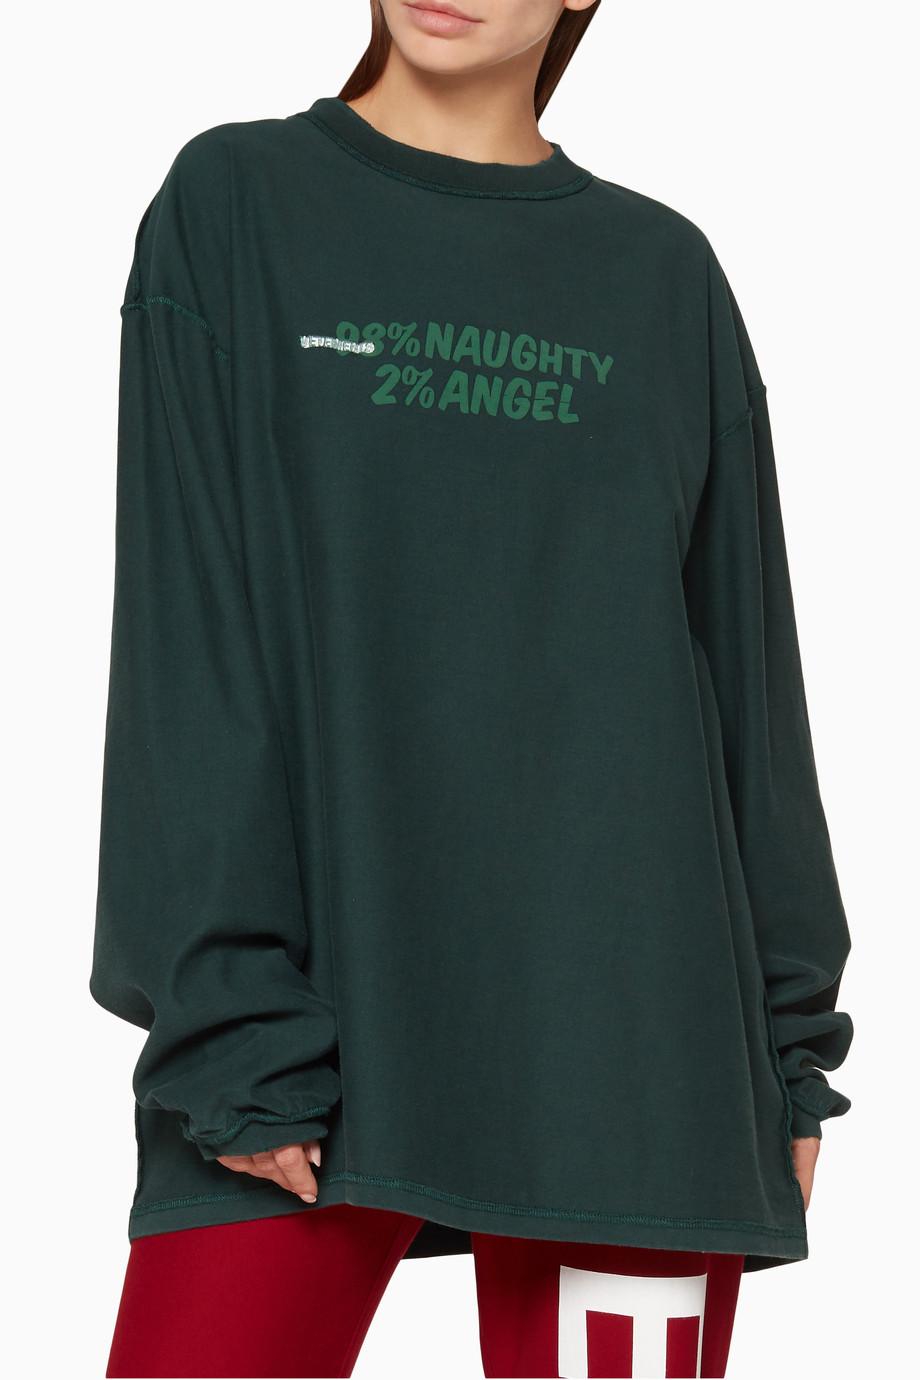 e6642d81 Shop Vetements Green Dark-Green Long-Sleeve Graphic T-Shirt for ...